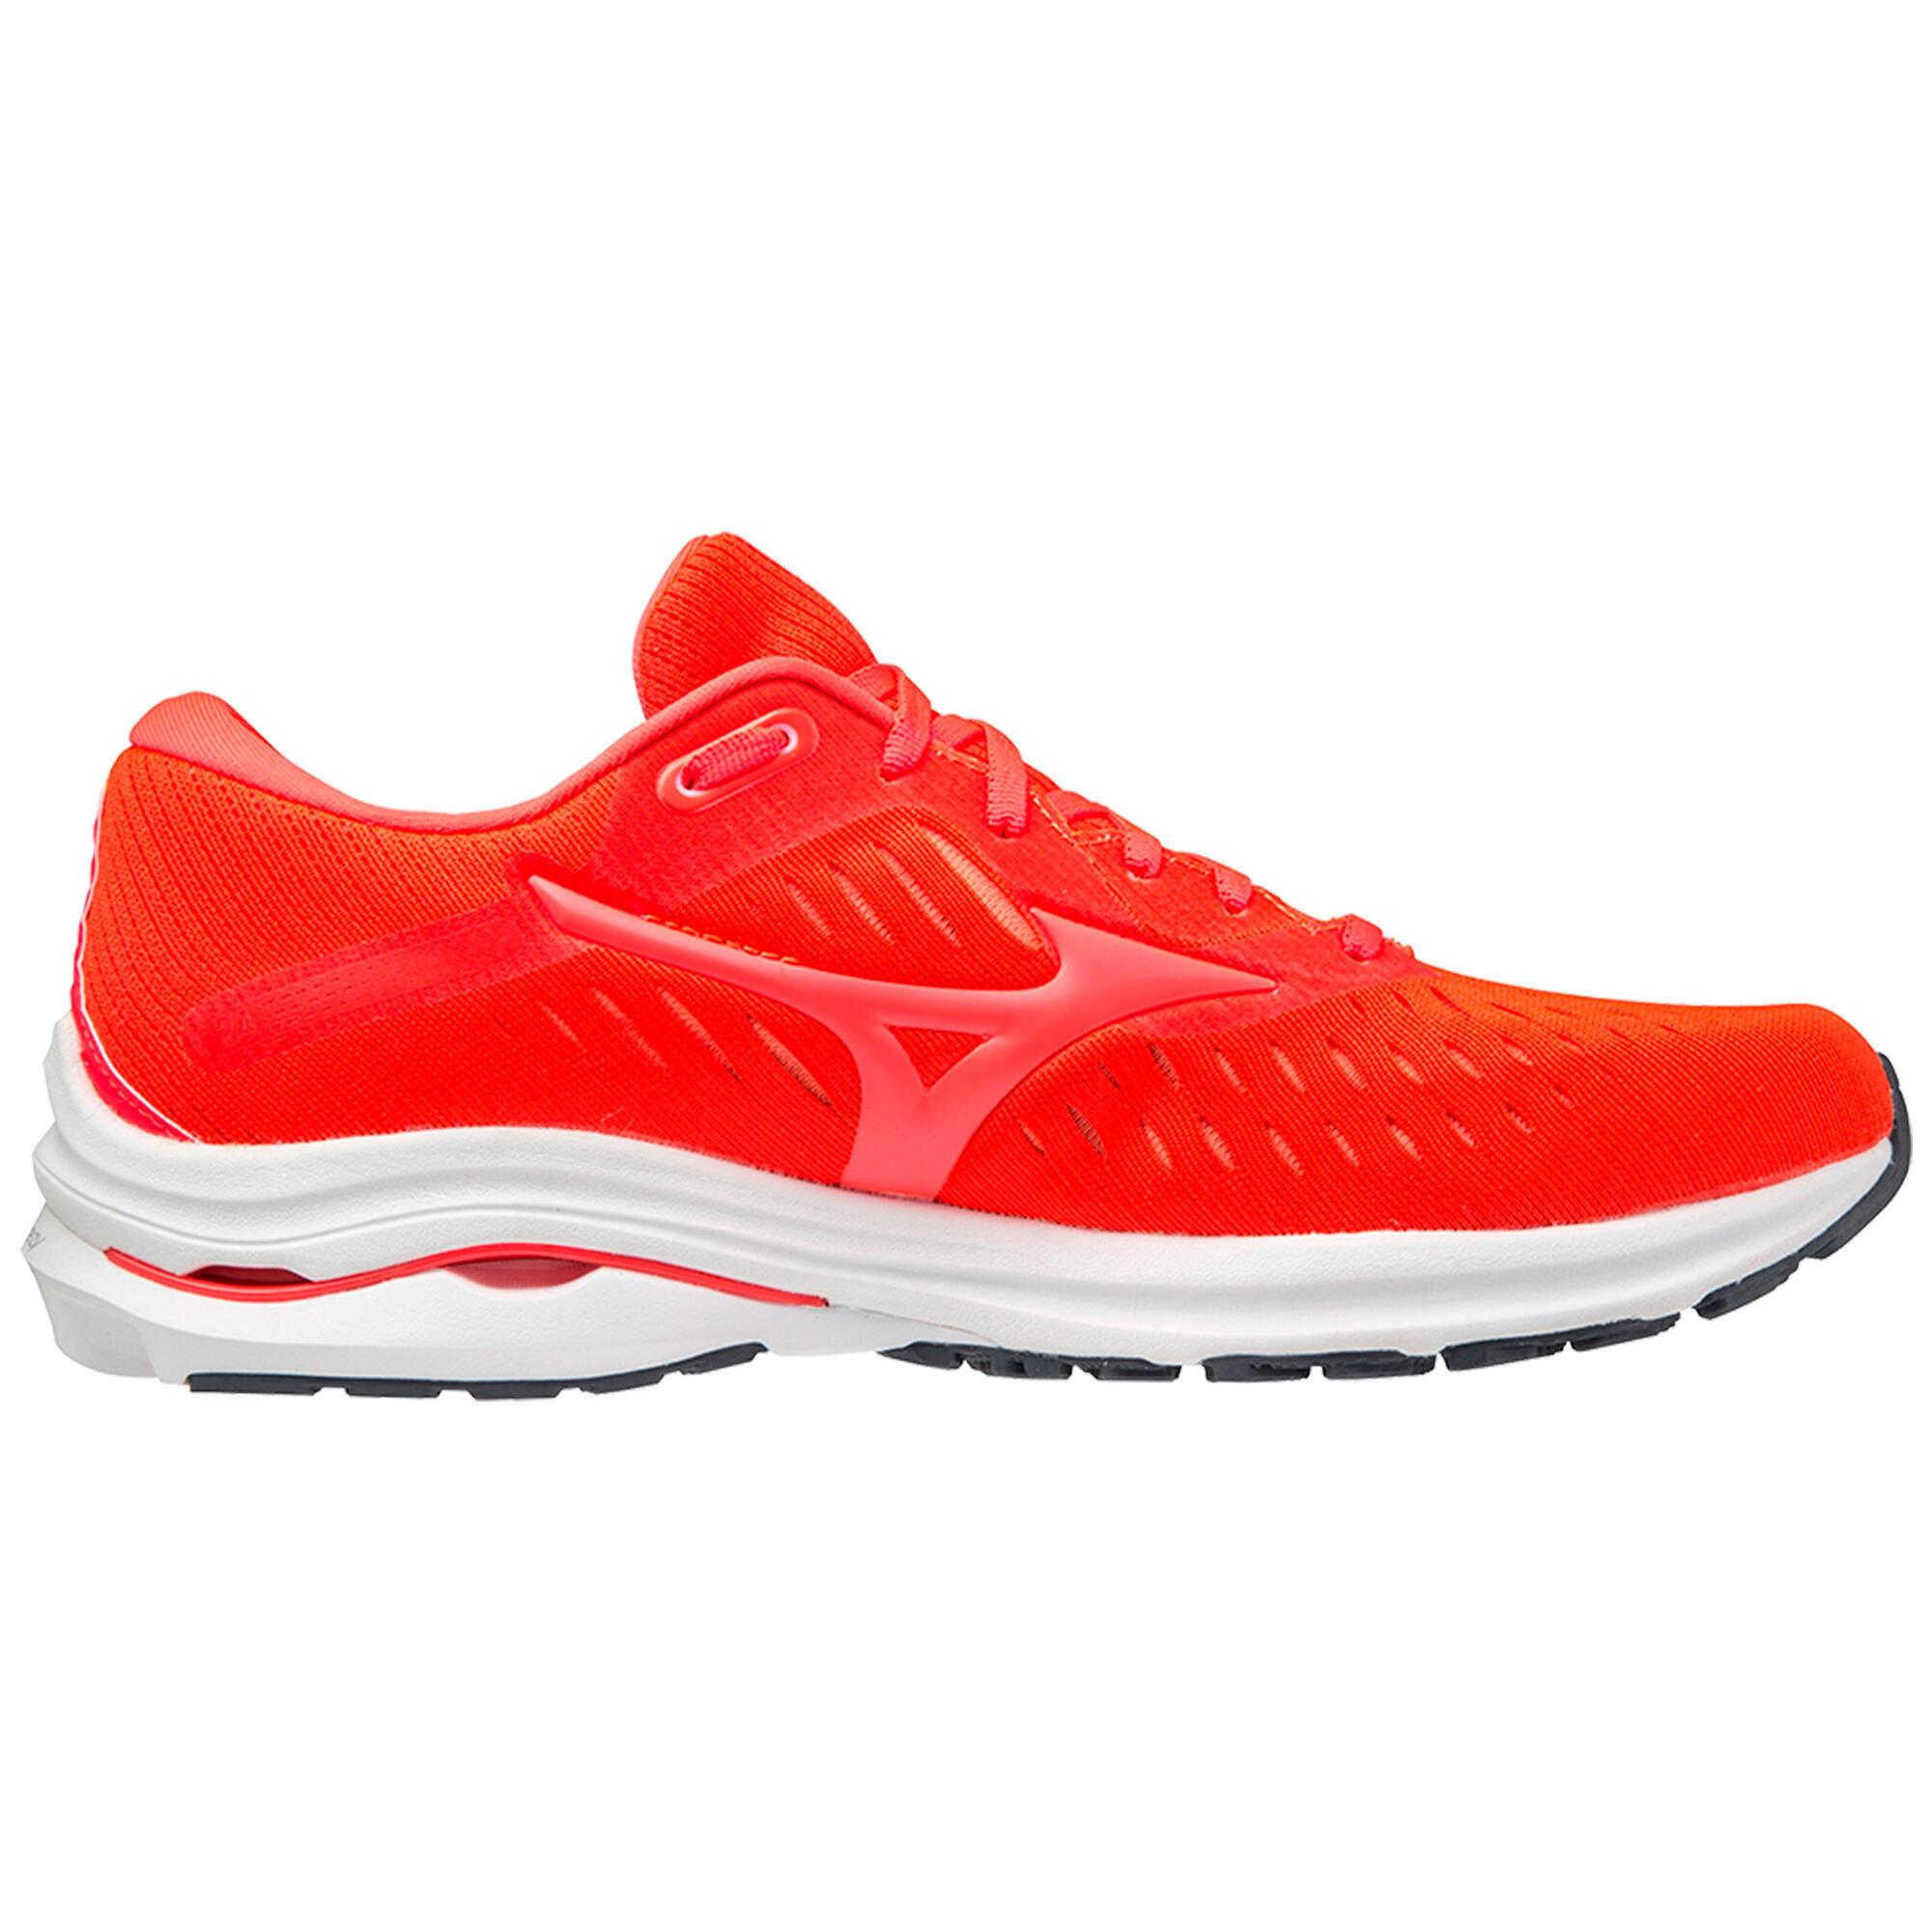 mizuno scarpe running uomo wave rider 24 rosse